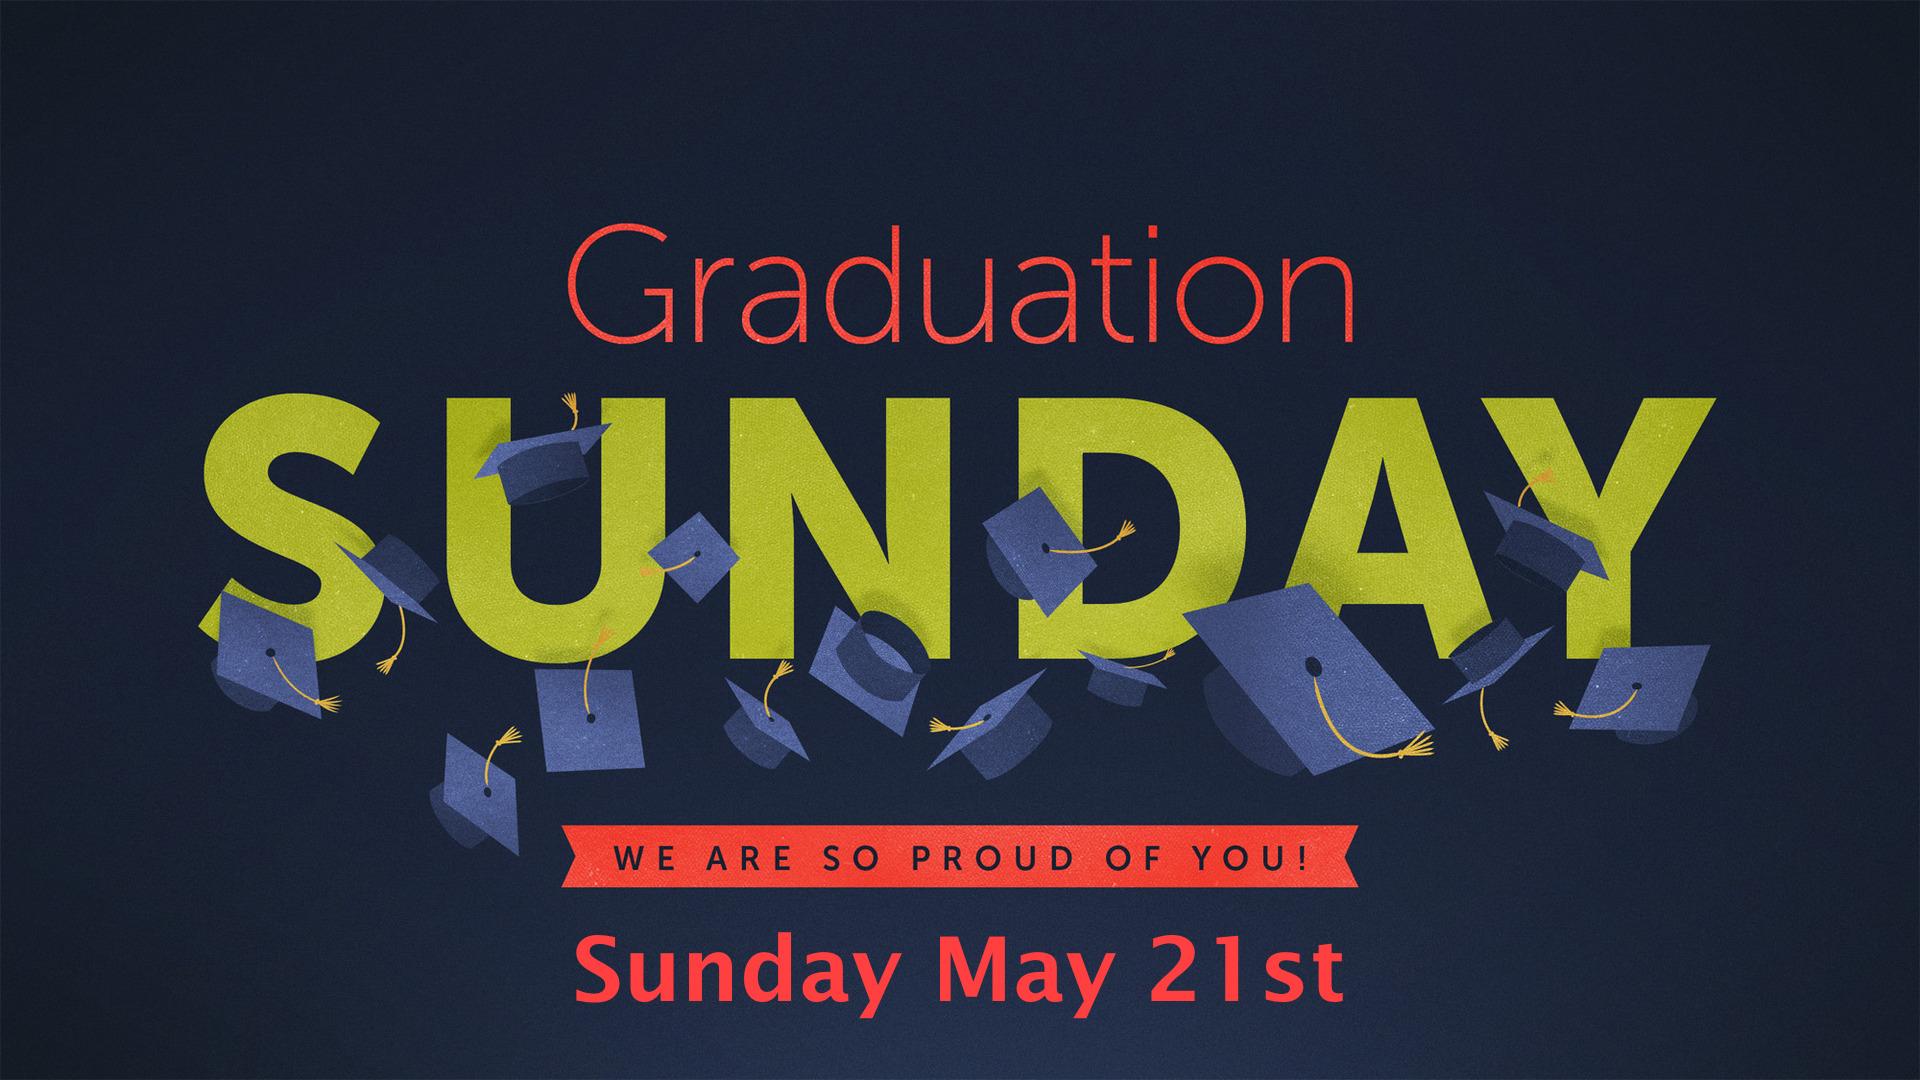 graduation_sunday-title-1-still-16x9.jpg